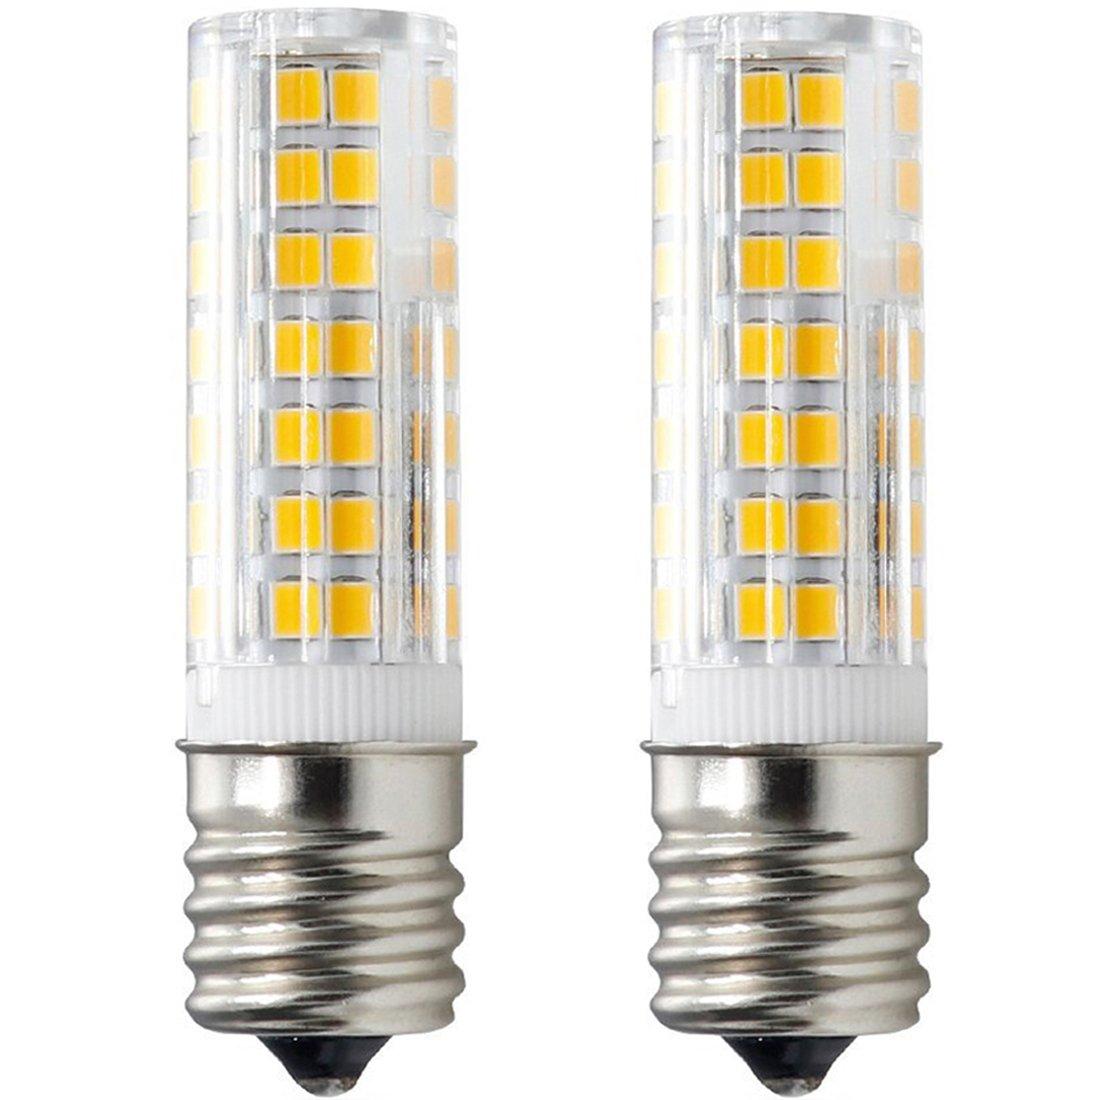 XRZT E17 LED Bulb for Microwave Oven Over Stove Appliance, 6 Watt(60W Halogen Bulbs Equivalent), 110-120V, Intermediate Base, Dimmable, 2-Pack (Warm White)